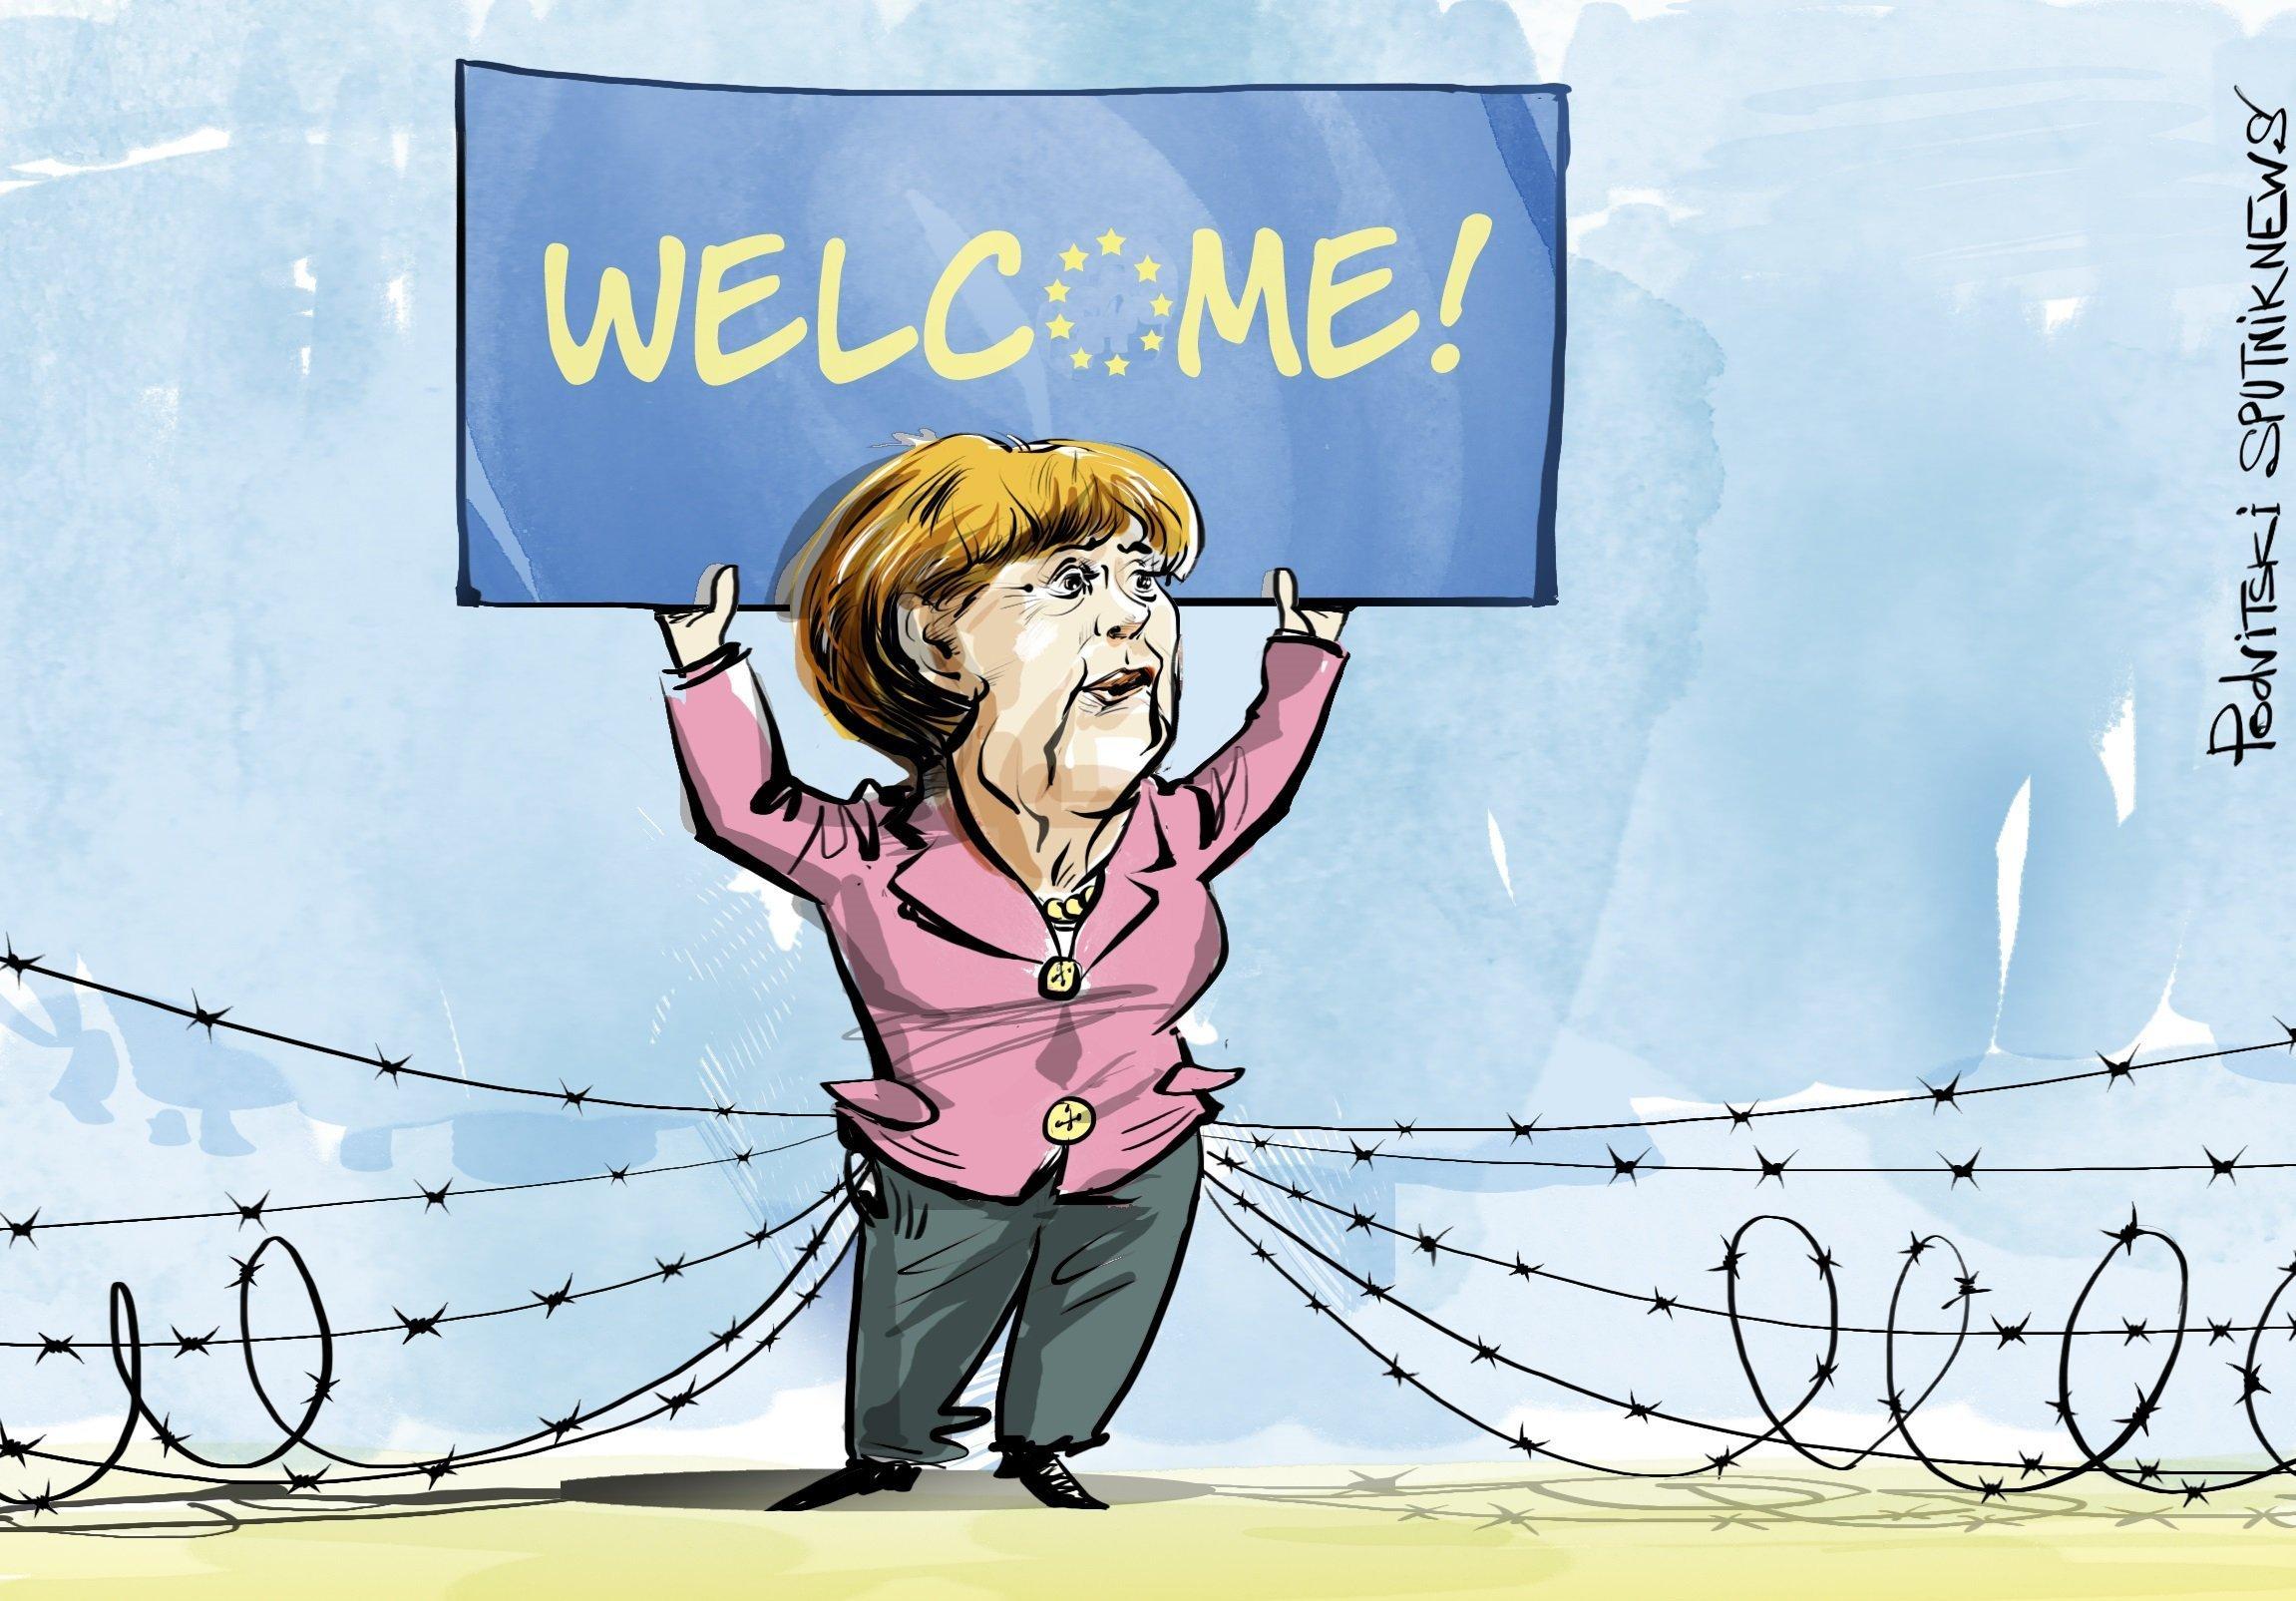 Le nouveau mur de Berlin, version UE